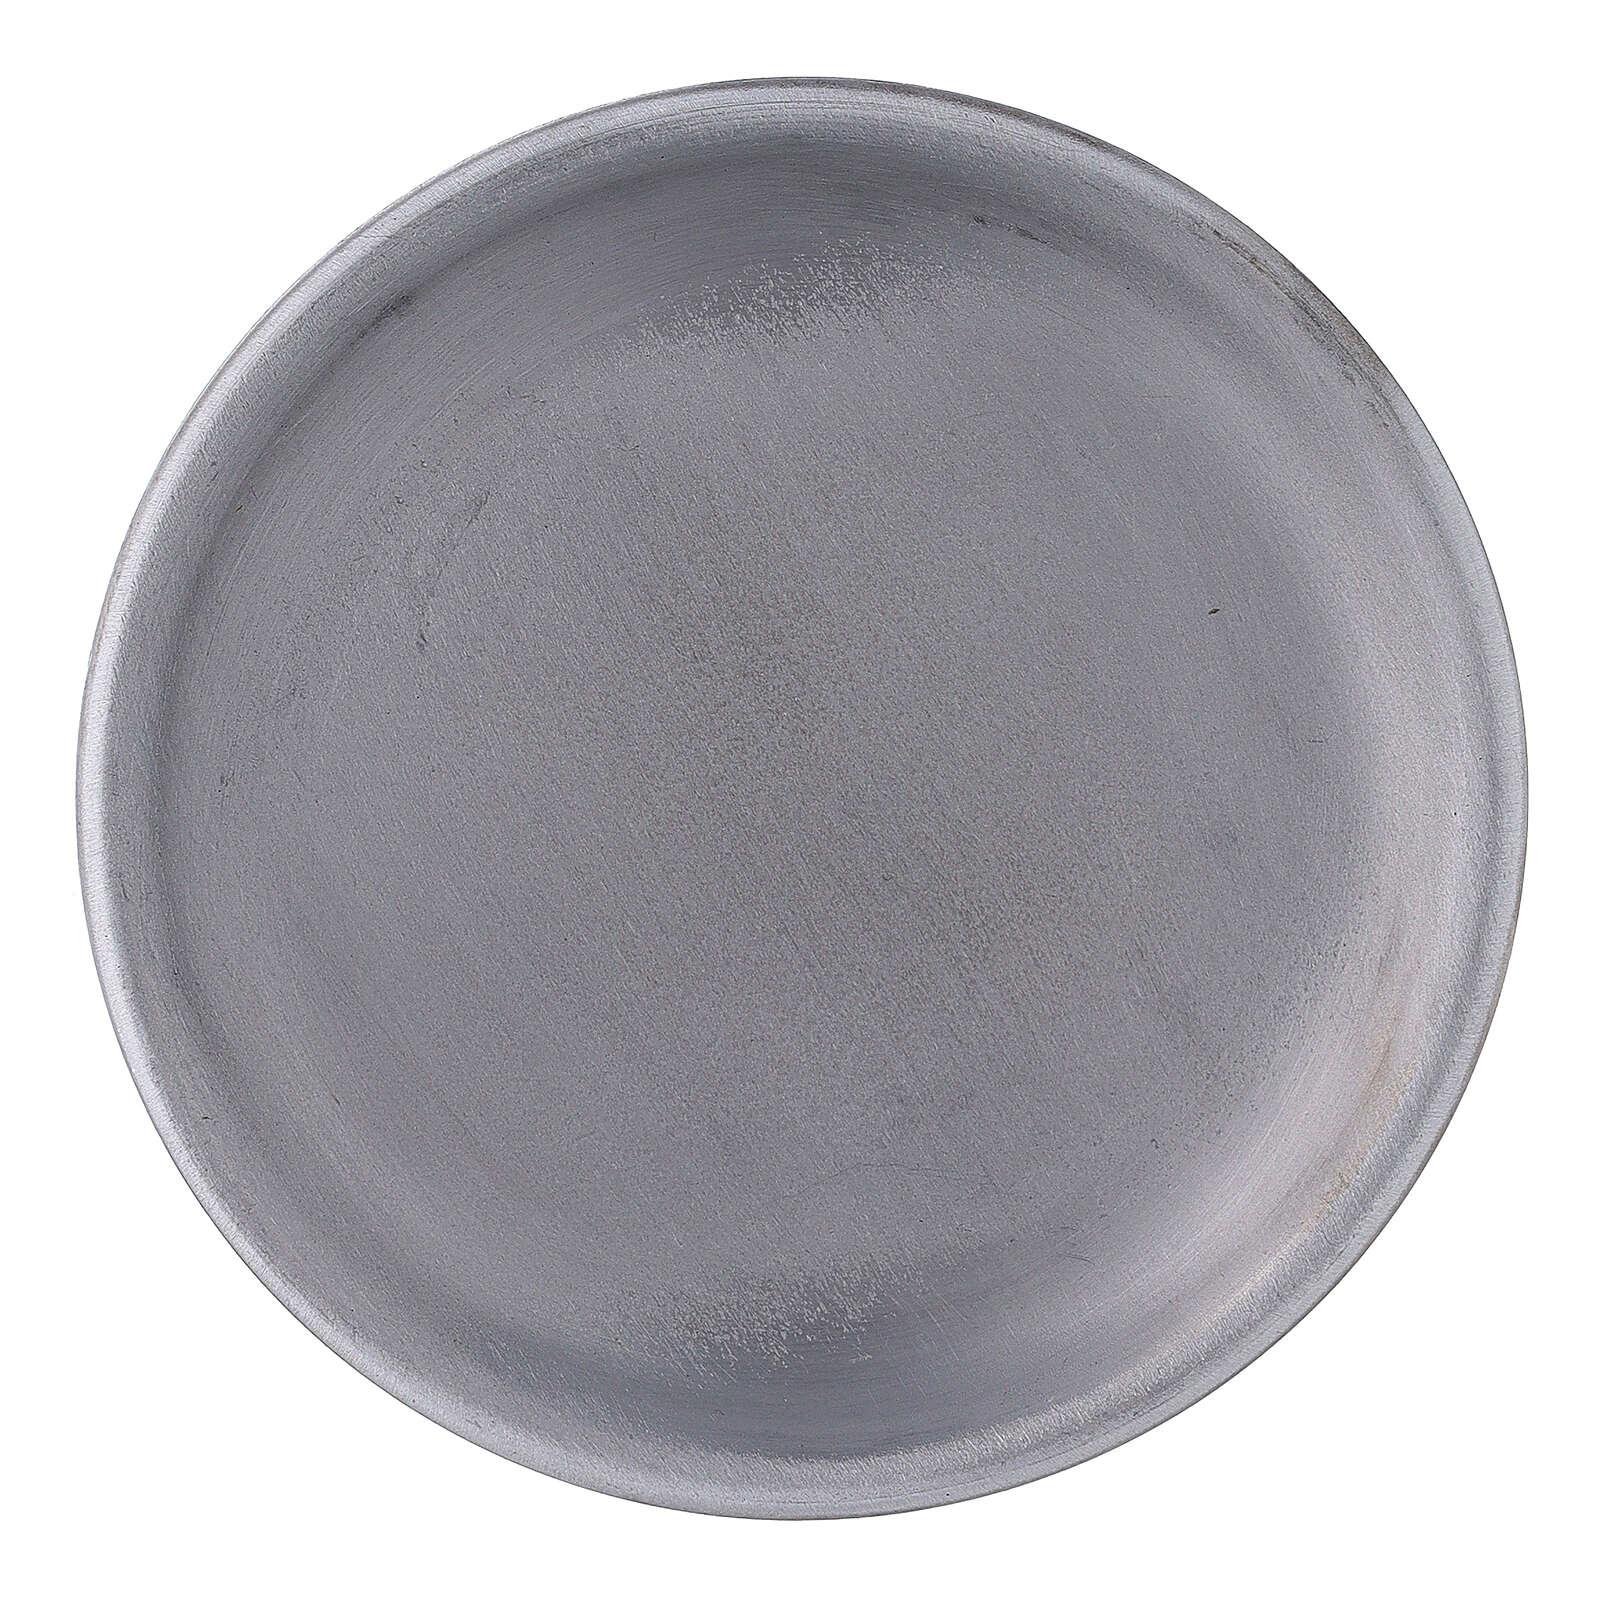 Portacandela bordi rialzati alluminio 10 cm 3